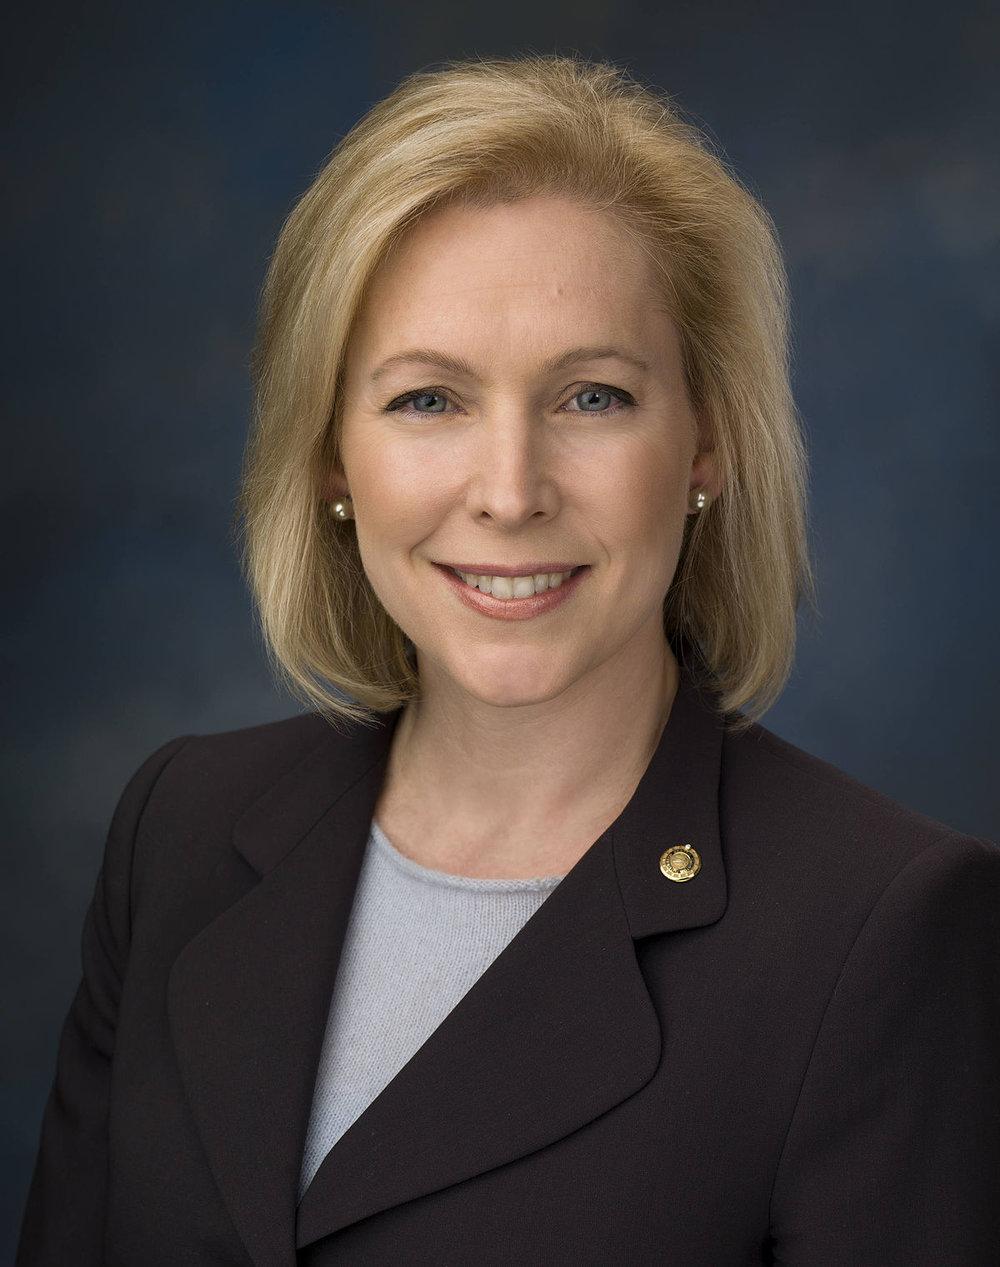 US Senator Kirsten Gillibrand